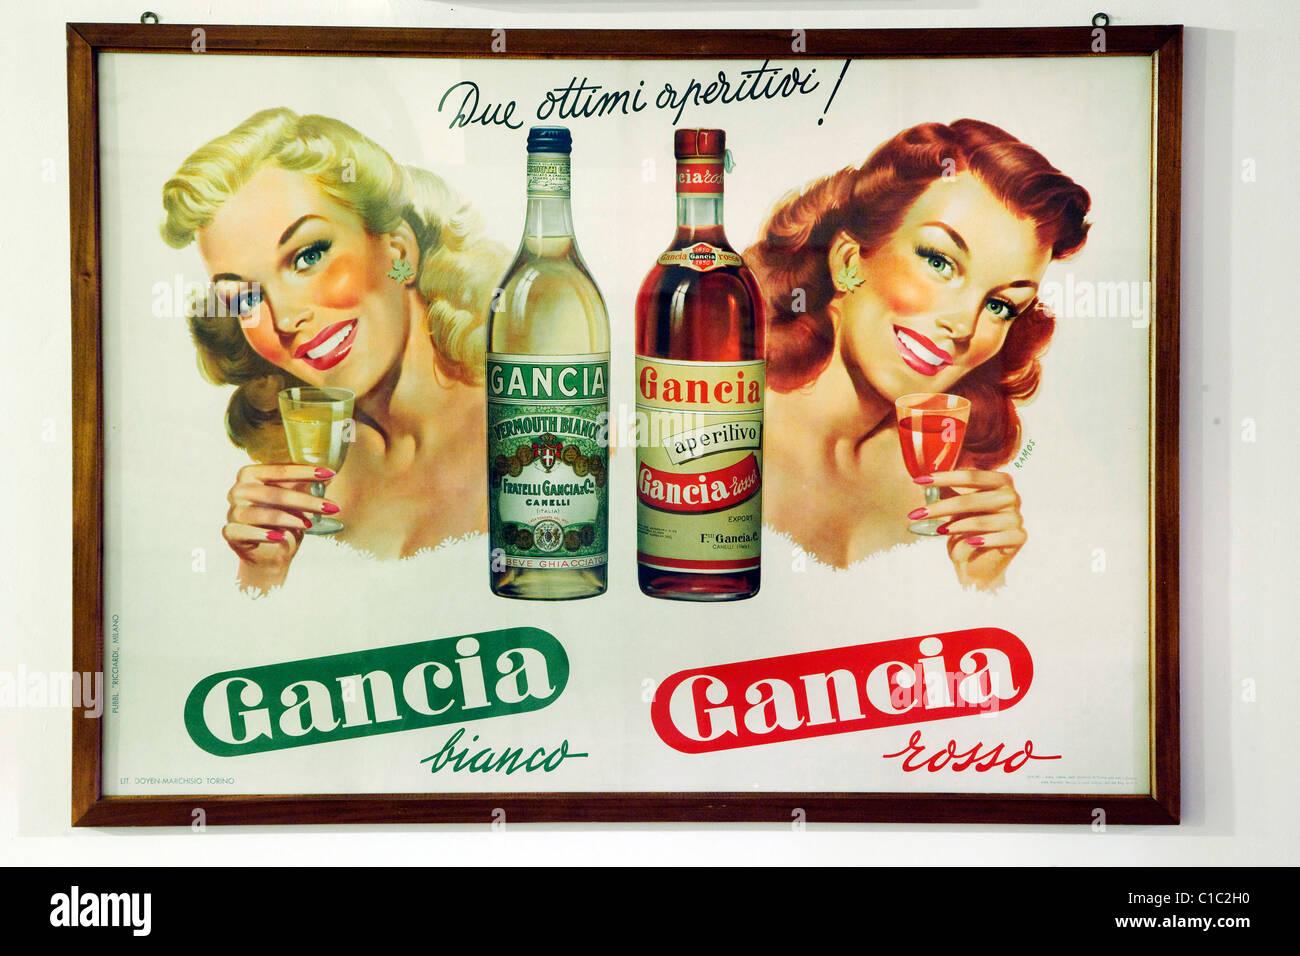 Gancia Underground Wine Cathedral In Canelli, Vintage Advertisment ...